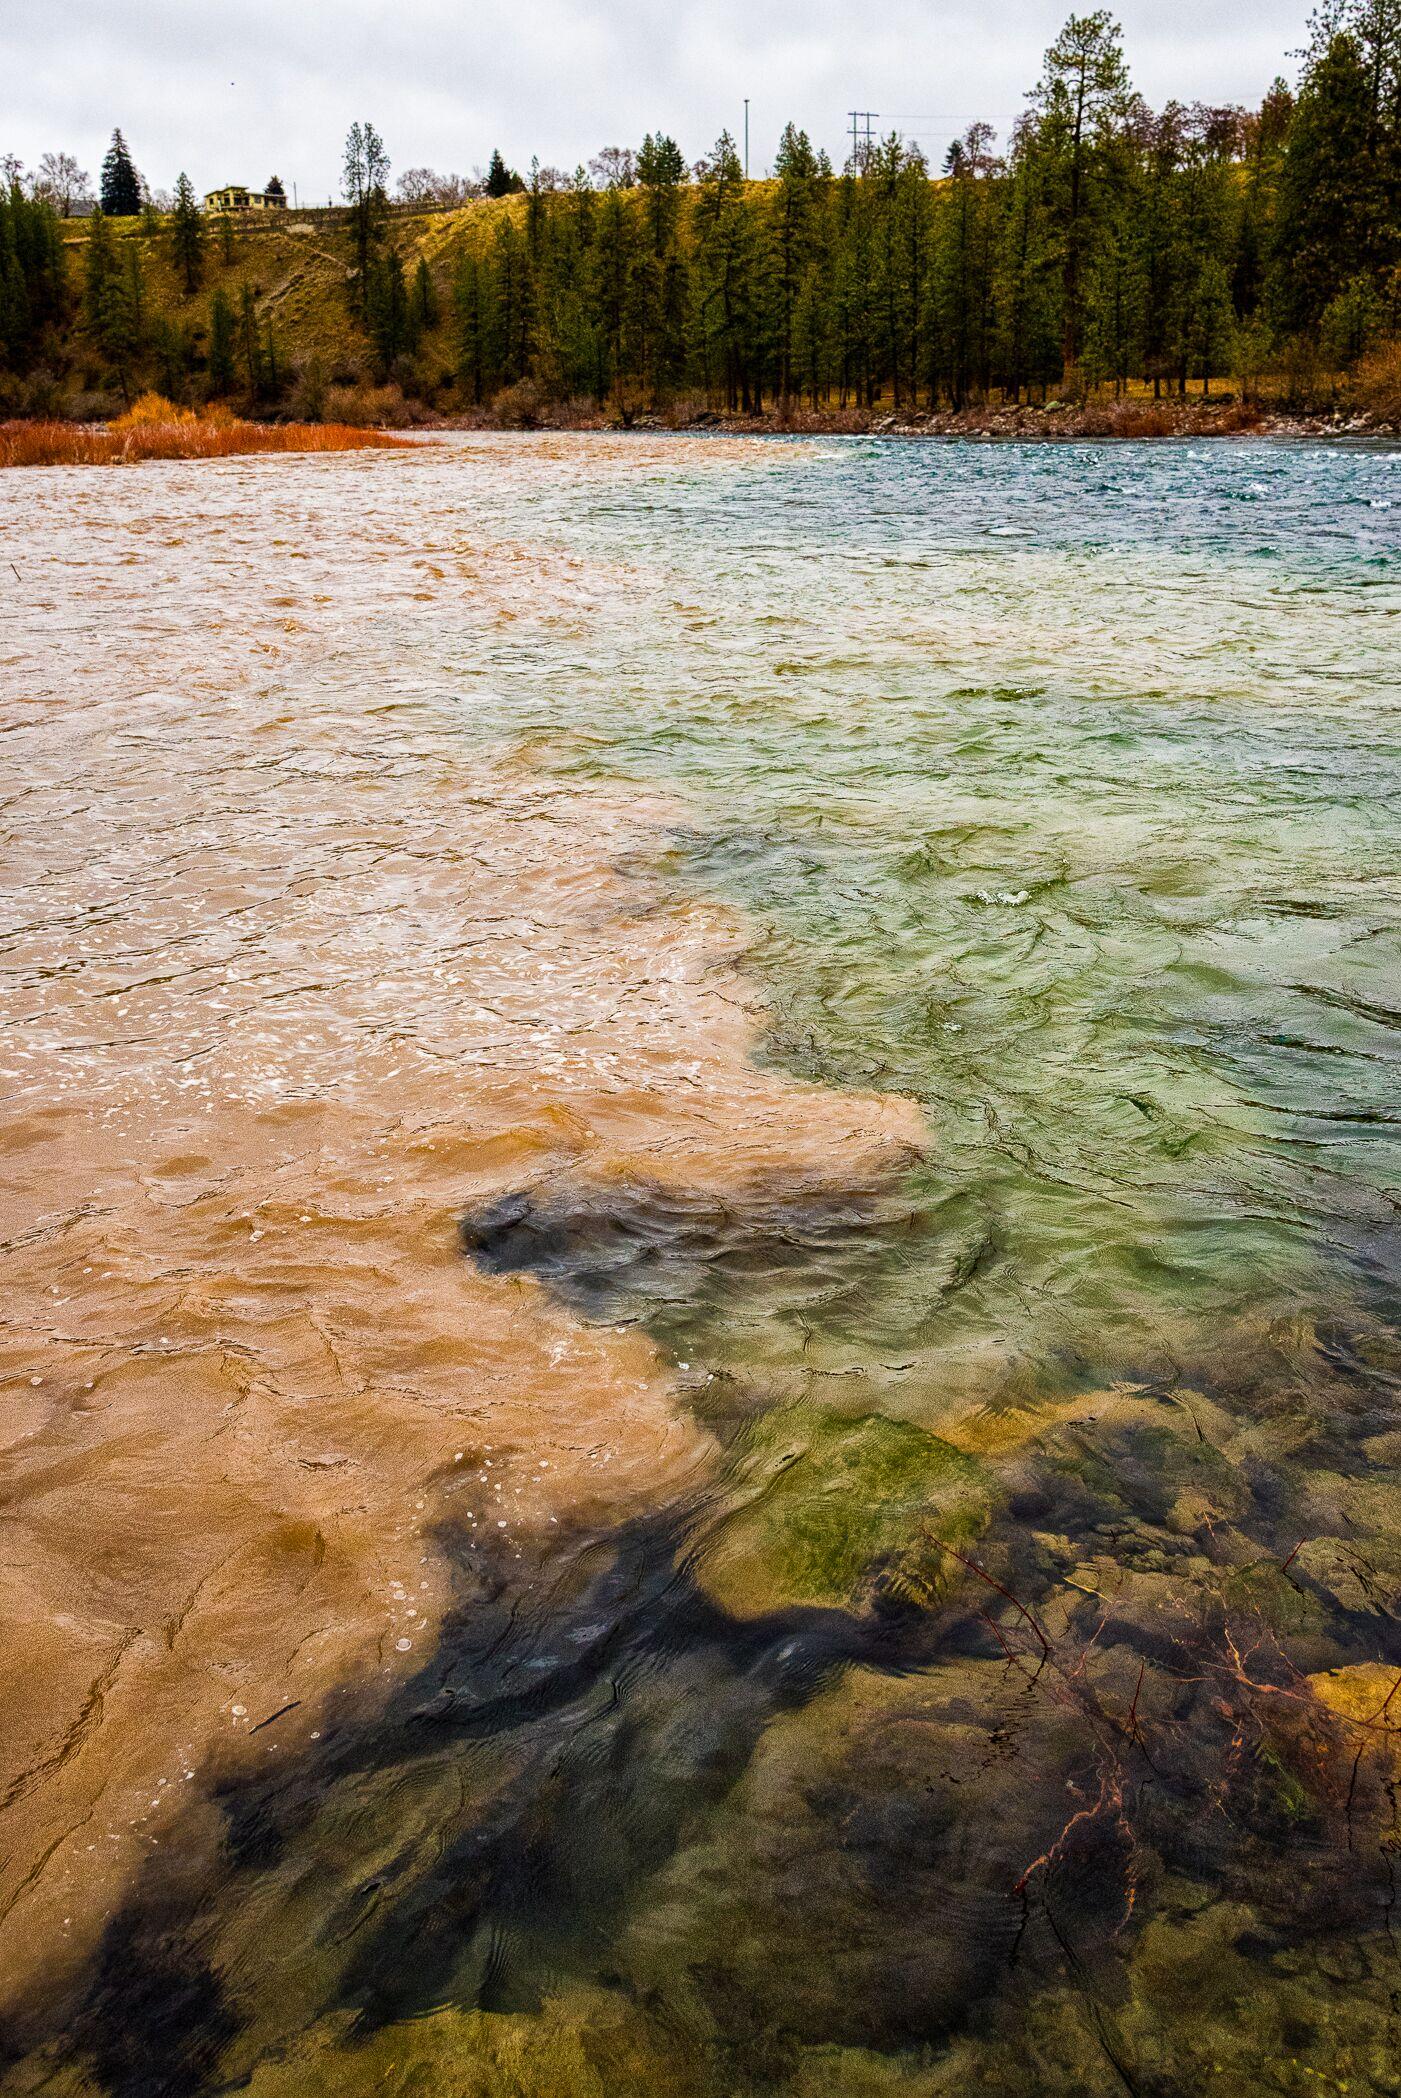 Sediment from Hangman Creek pollutes the Spokane River, burying fish nests and macroinvertebrates.